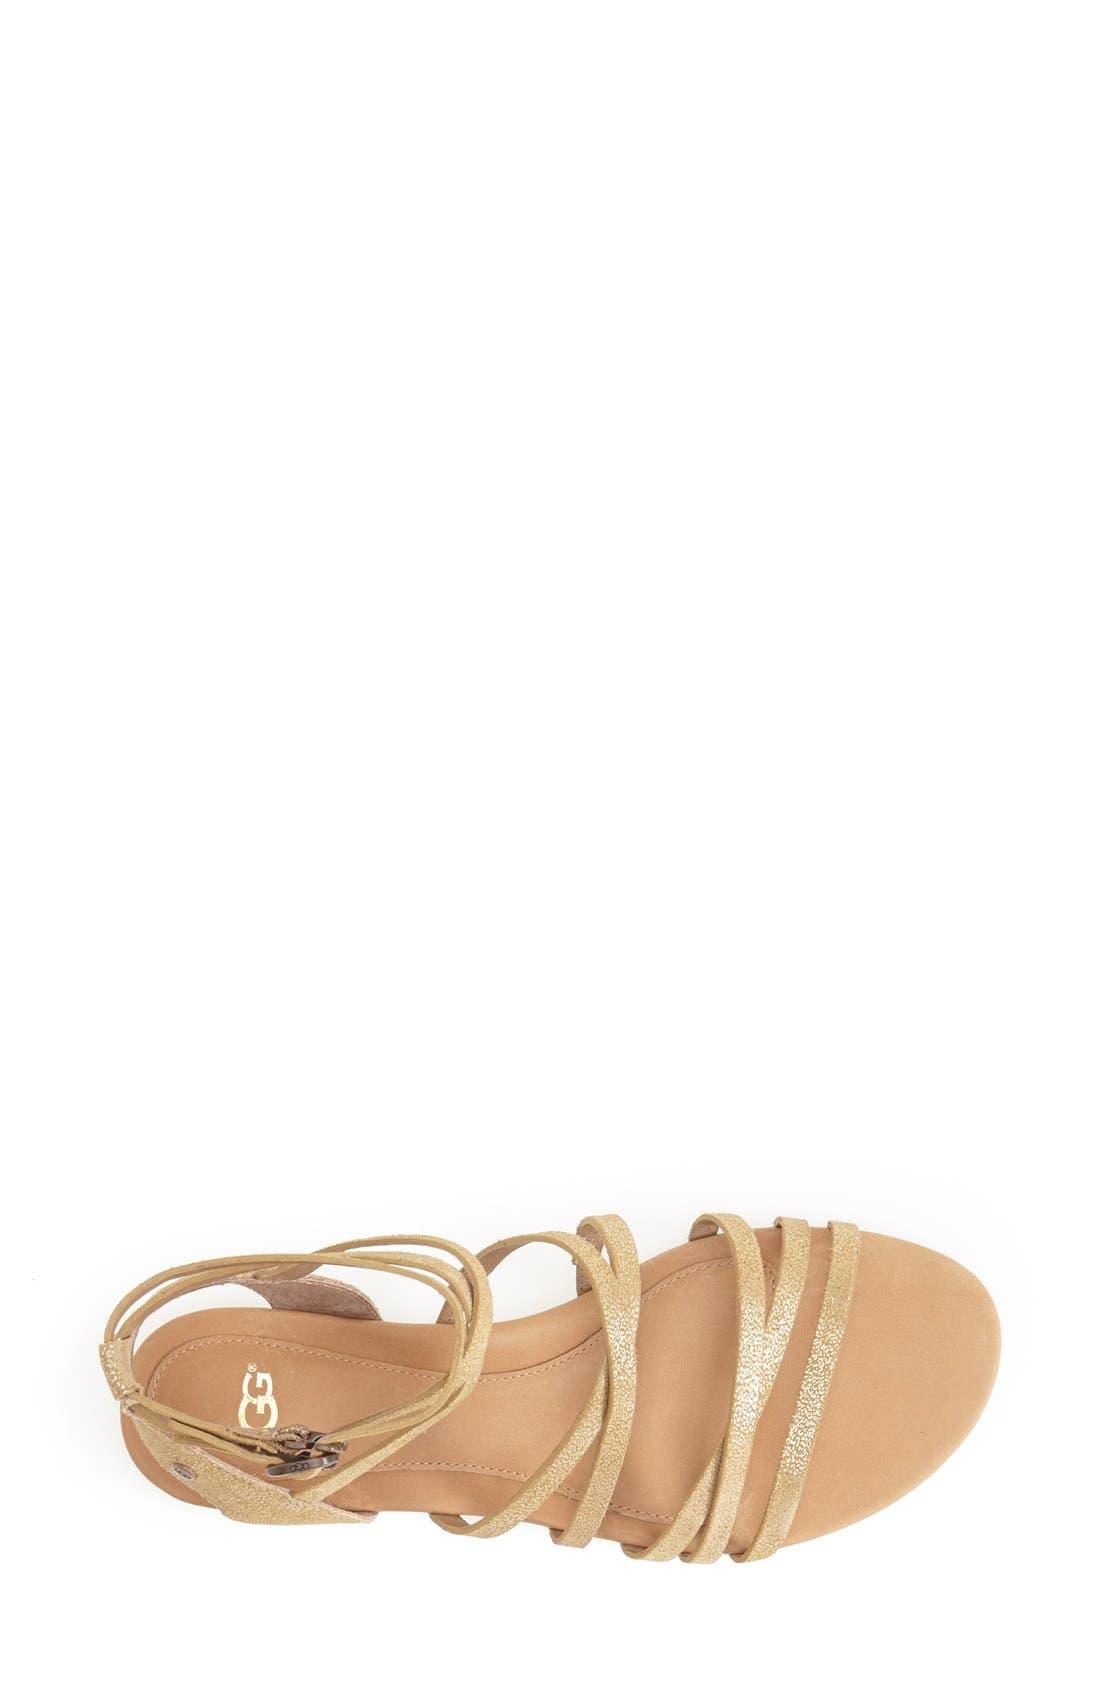 Alternate Image 3  - UGG® Australia 'Devie' Metallic Leather Sandal (Women)